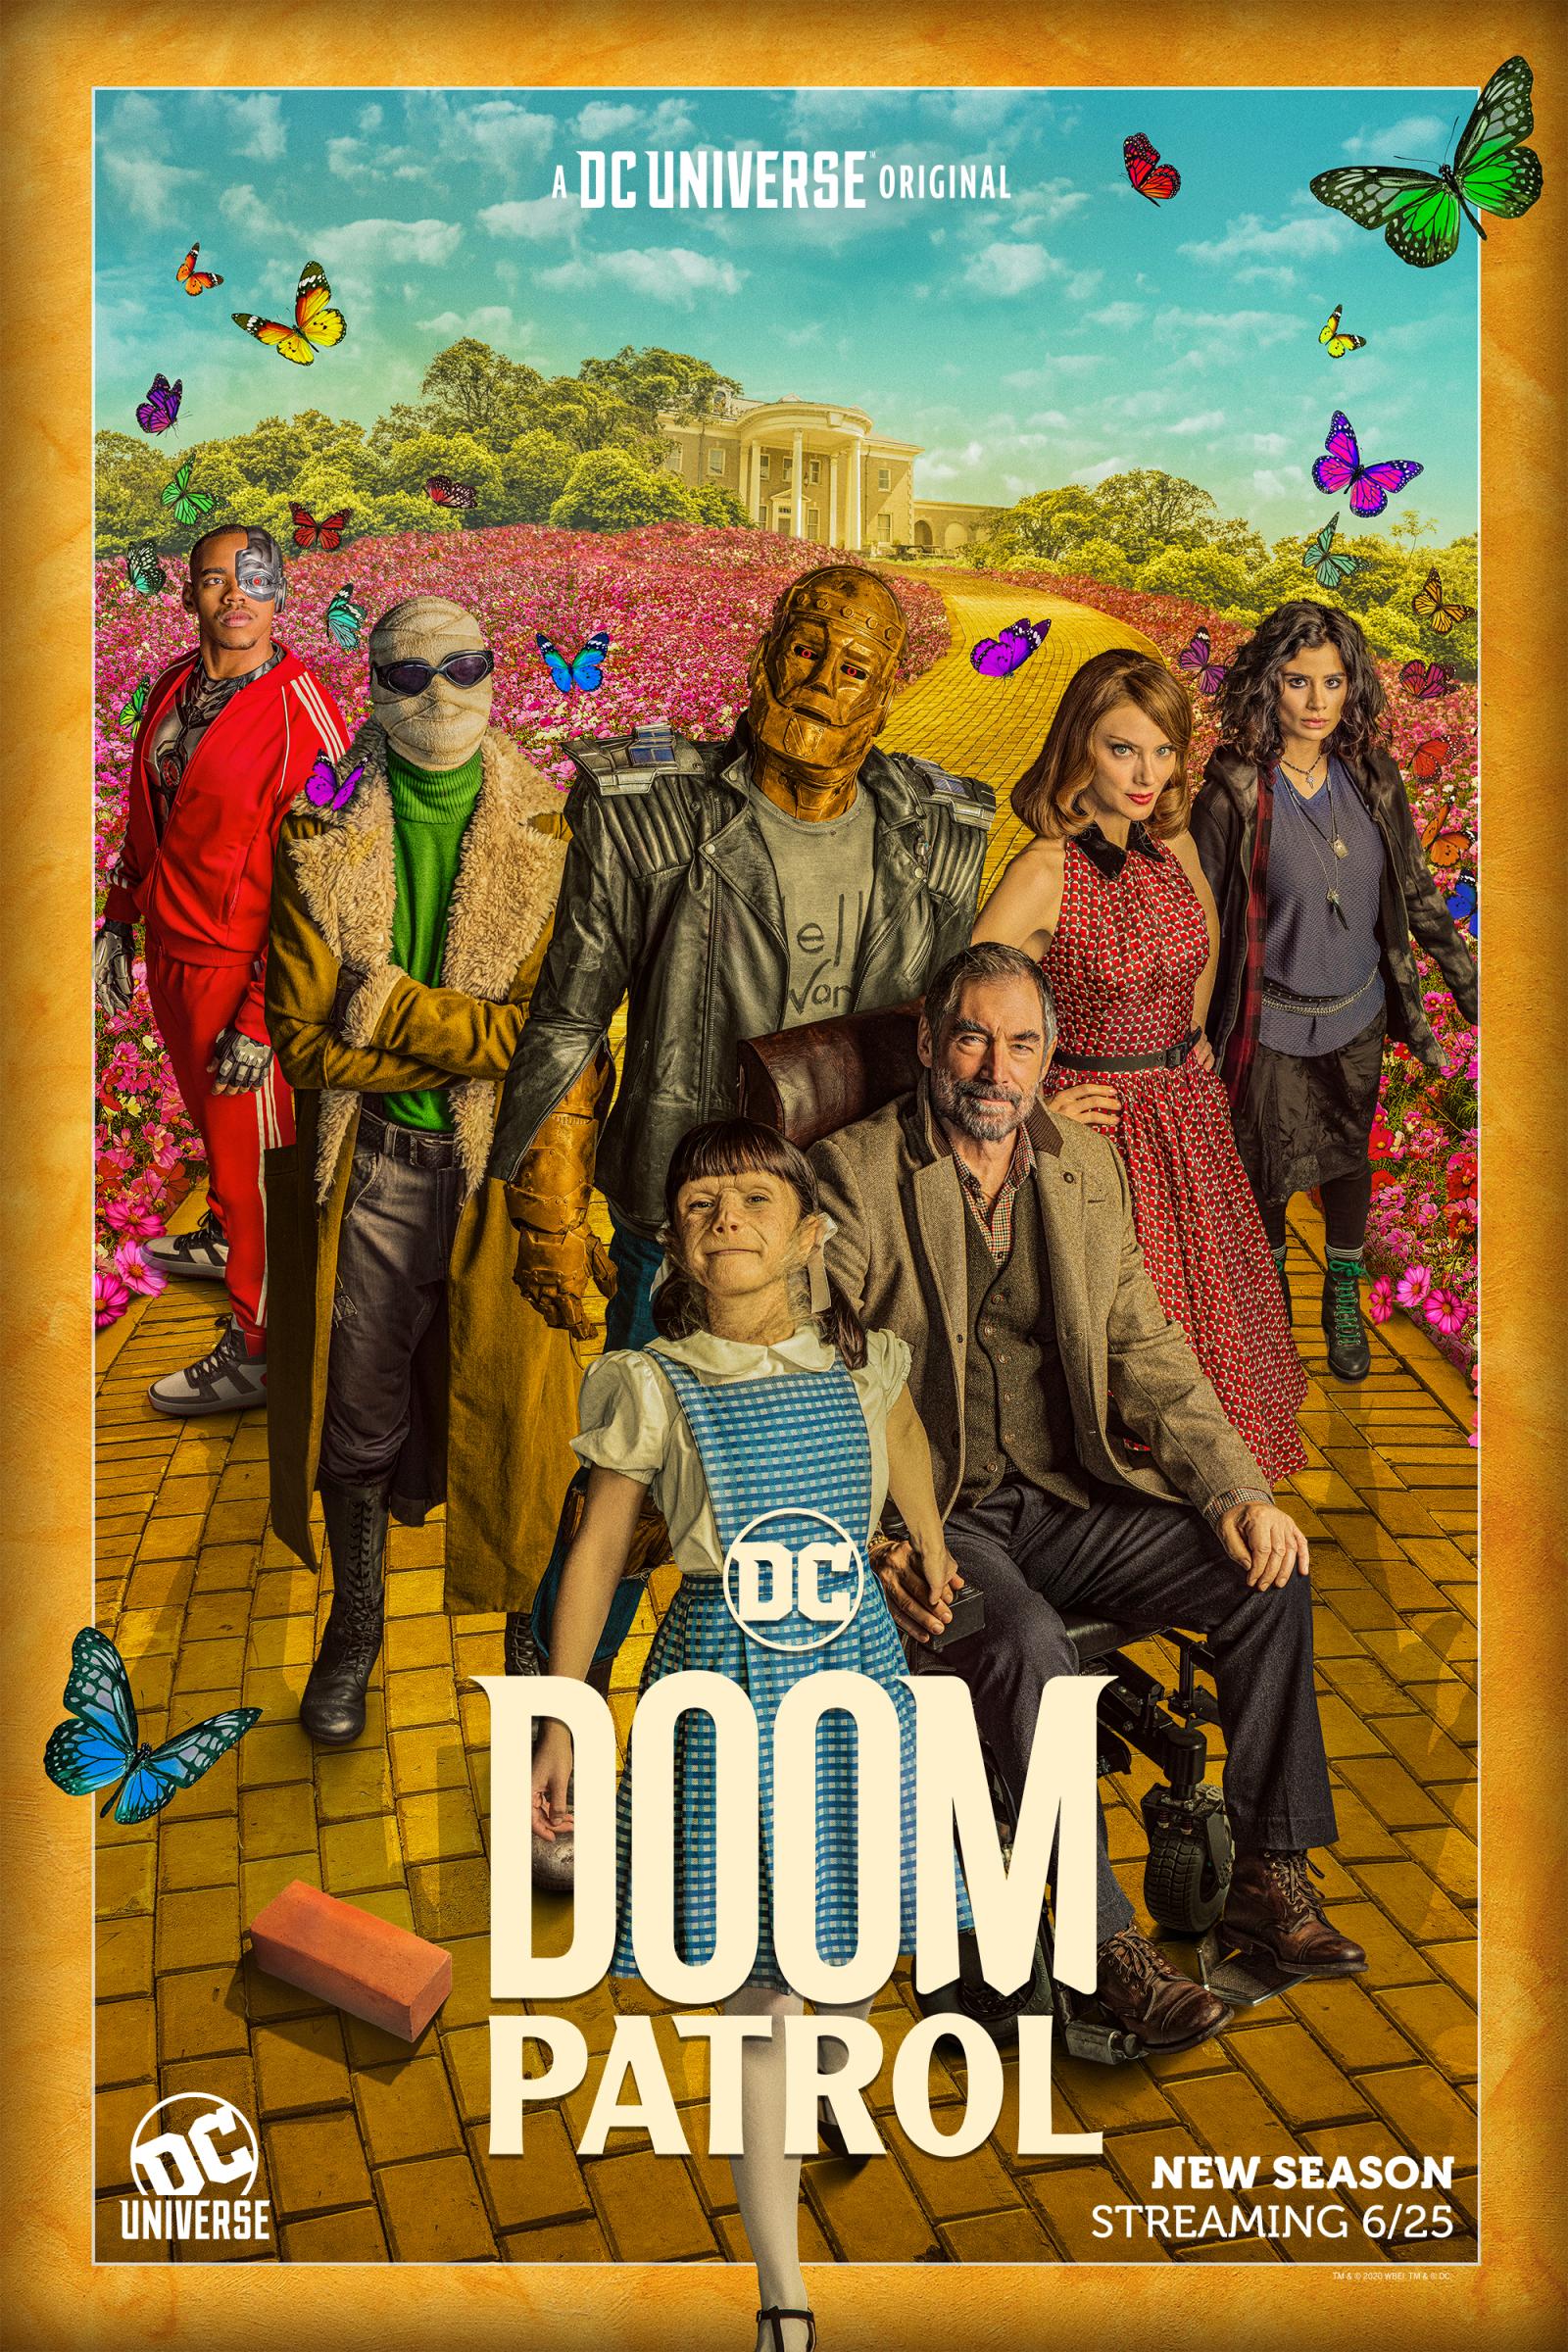 doom patrol season 2 dorothy powers